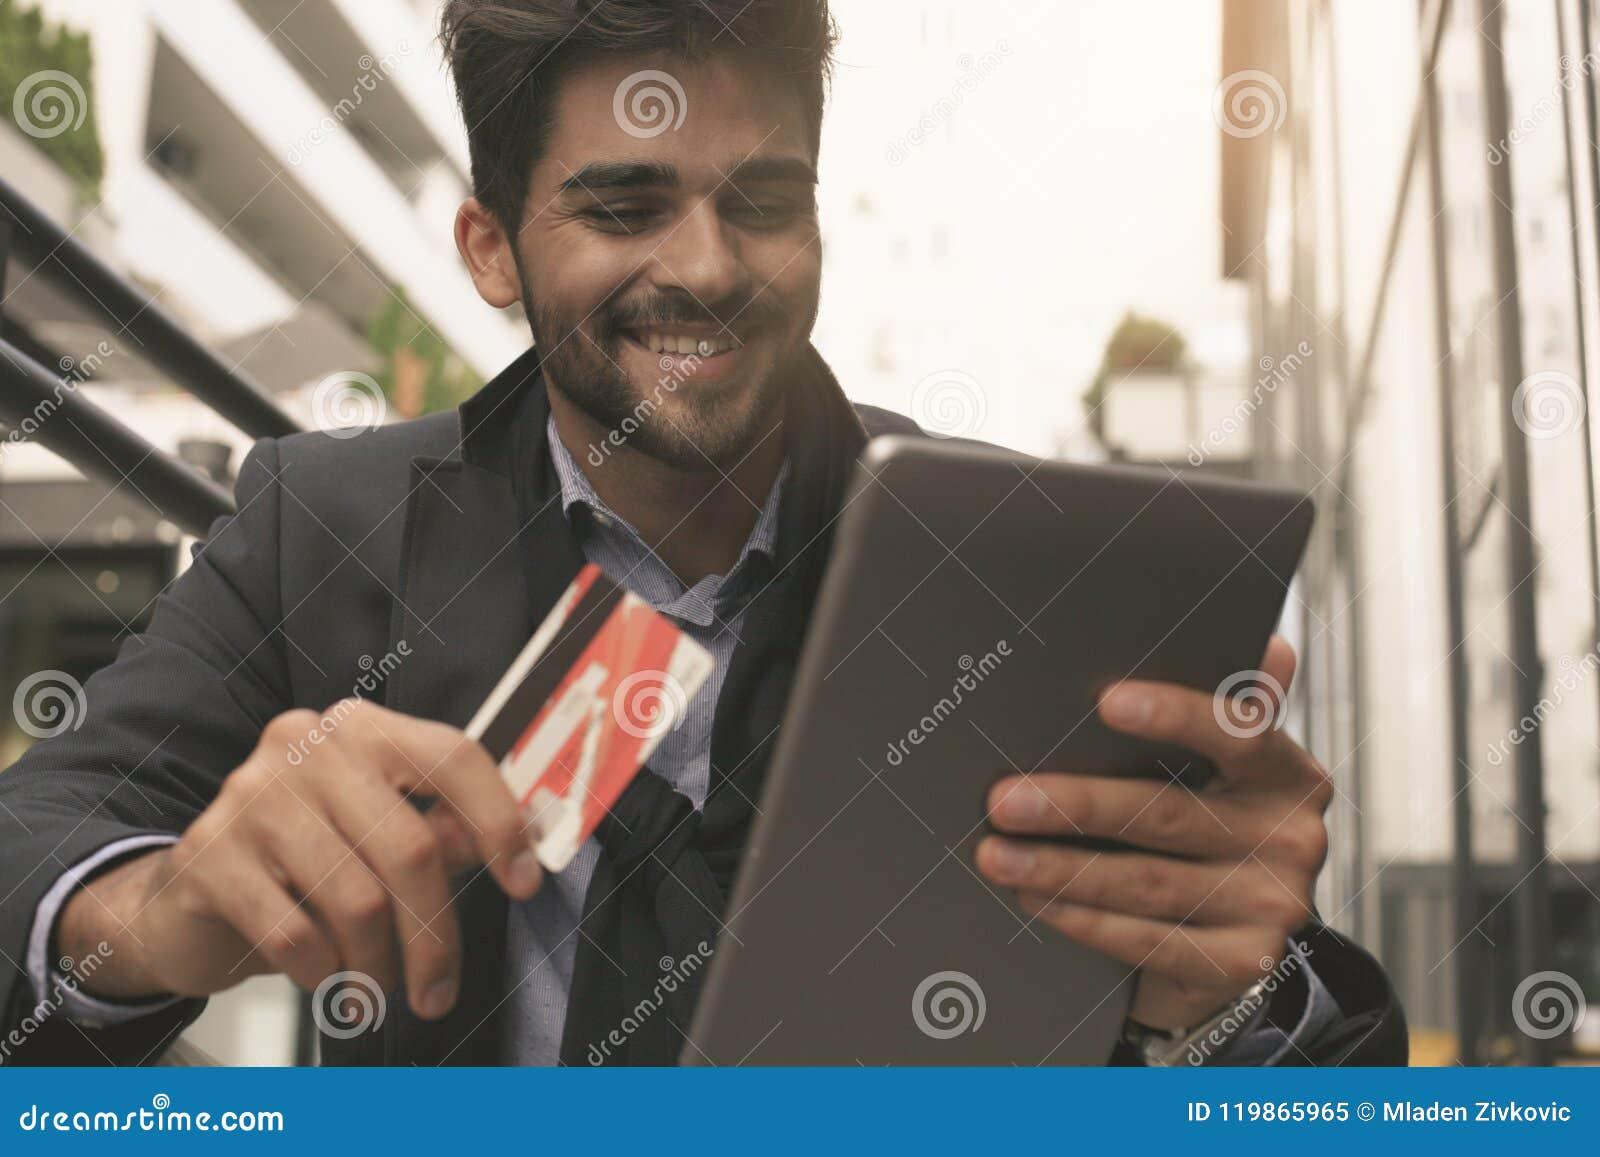 Бизнесмен держа кредитную карточку и цифровую таблетку